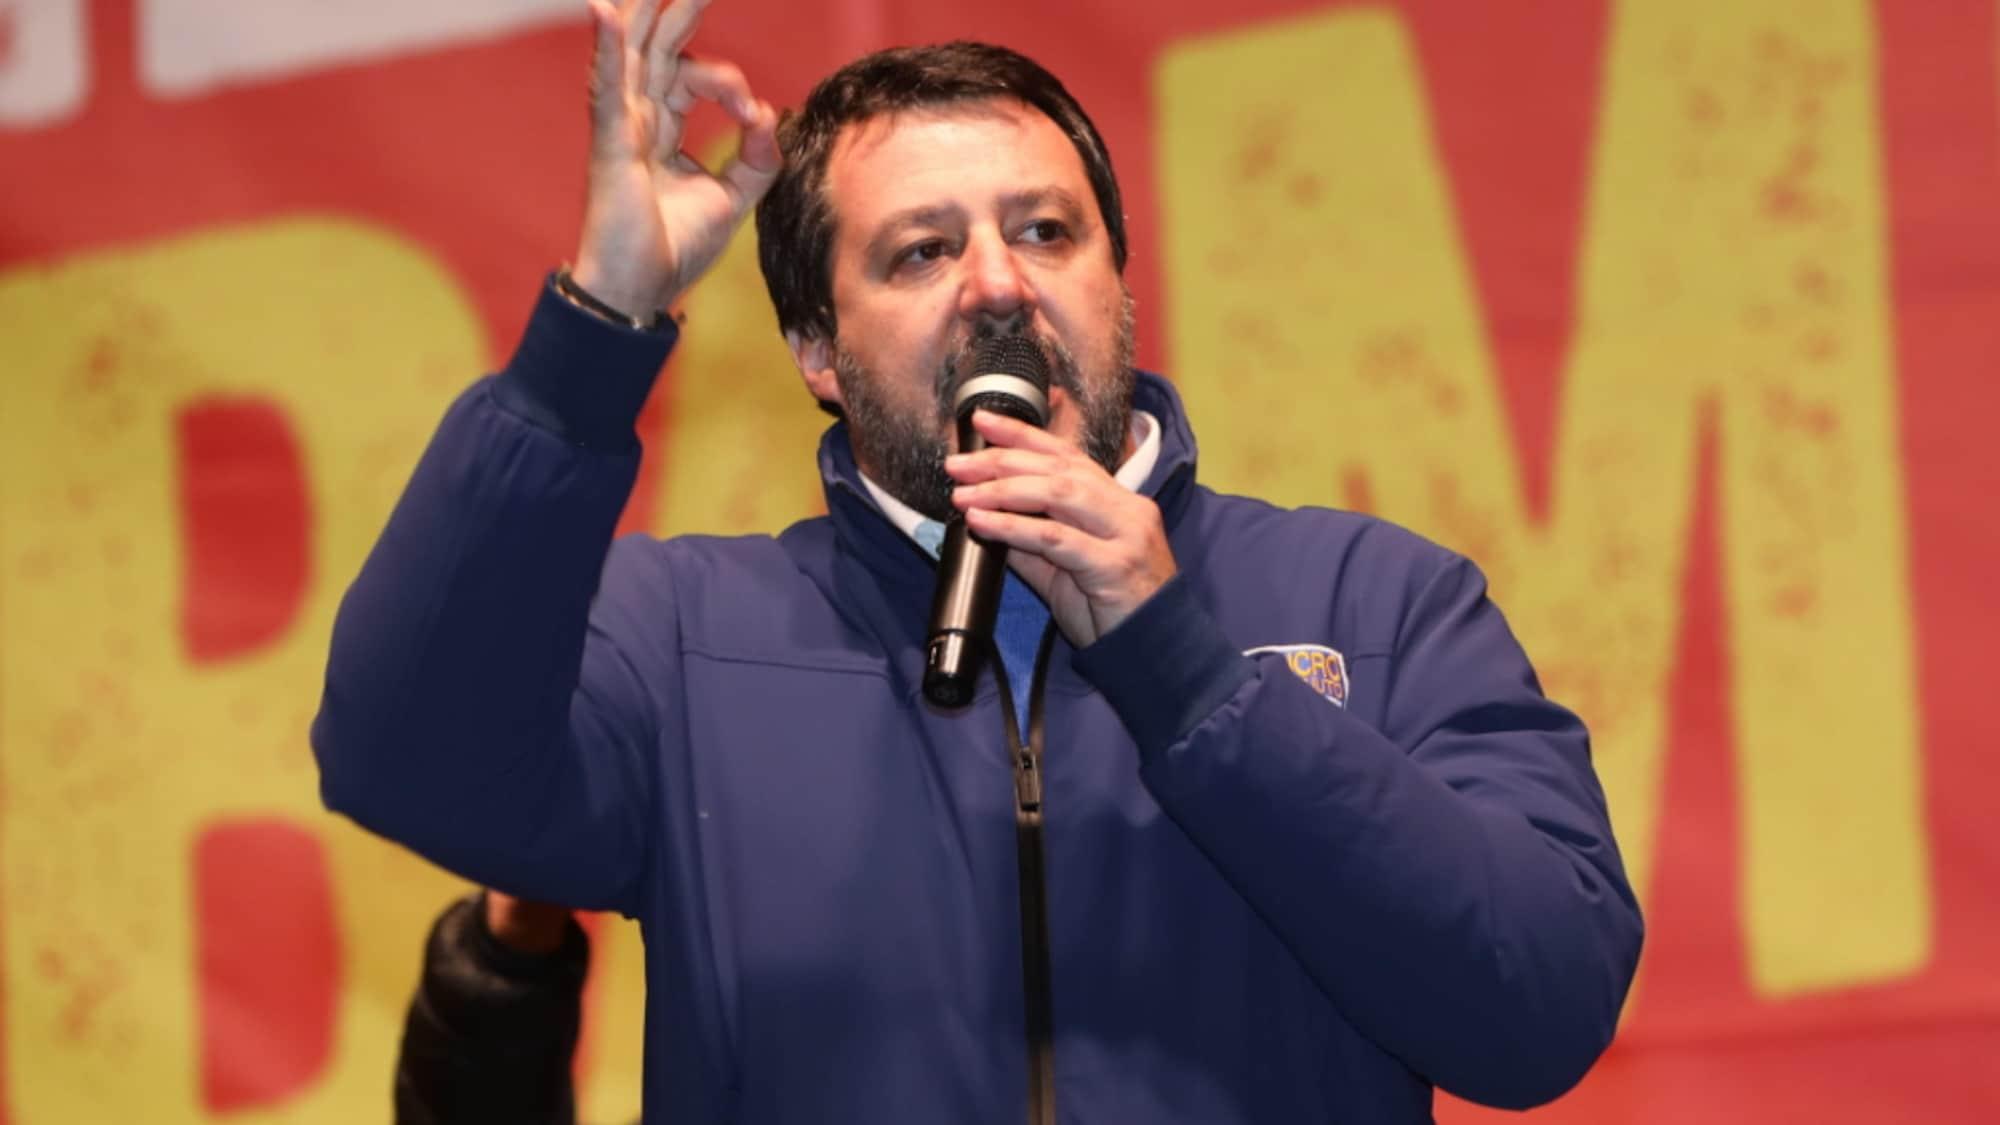 Italien: Salvini laut Prognose mit Niederlage bei Regionalwahl in Italien